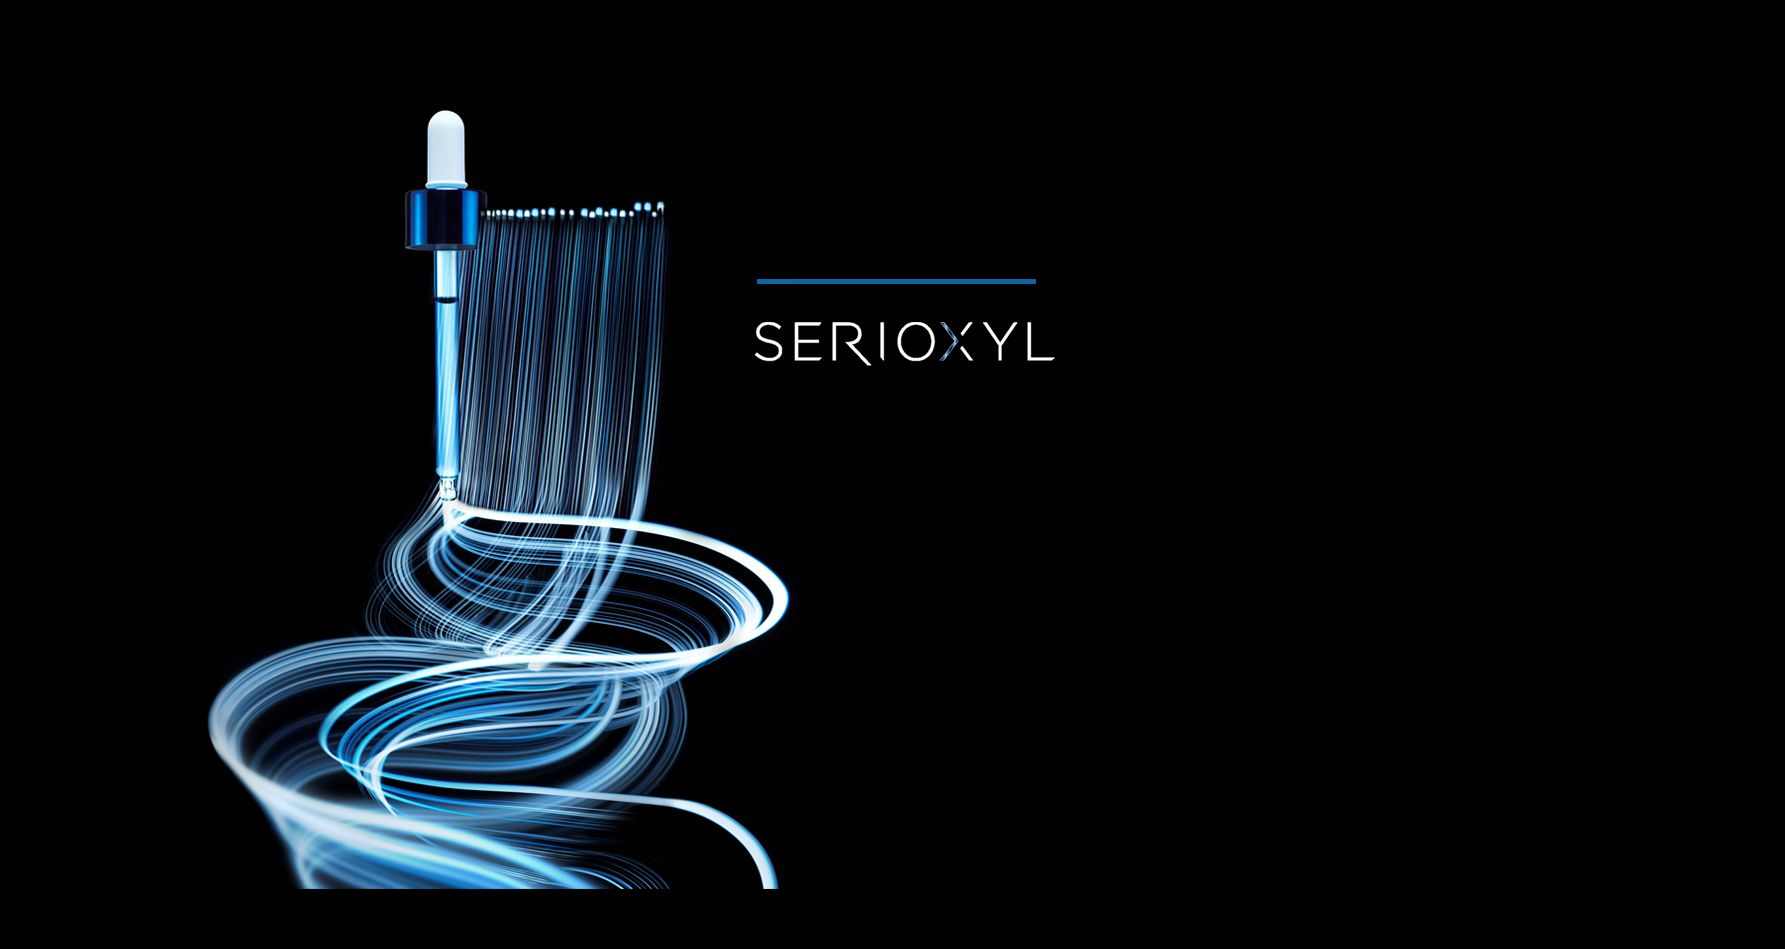 Serioxyl Pipette and Logo